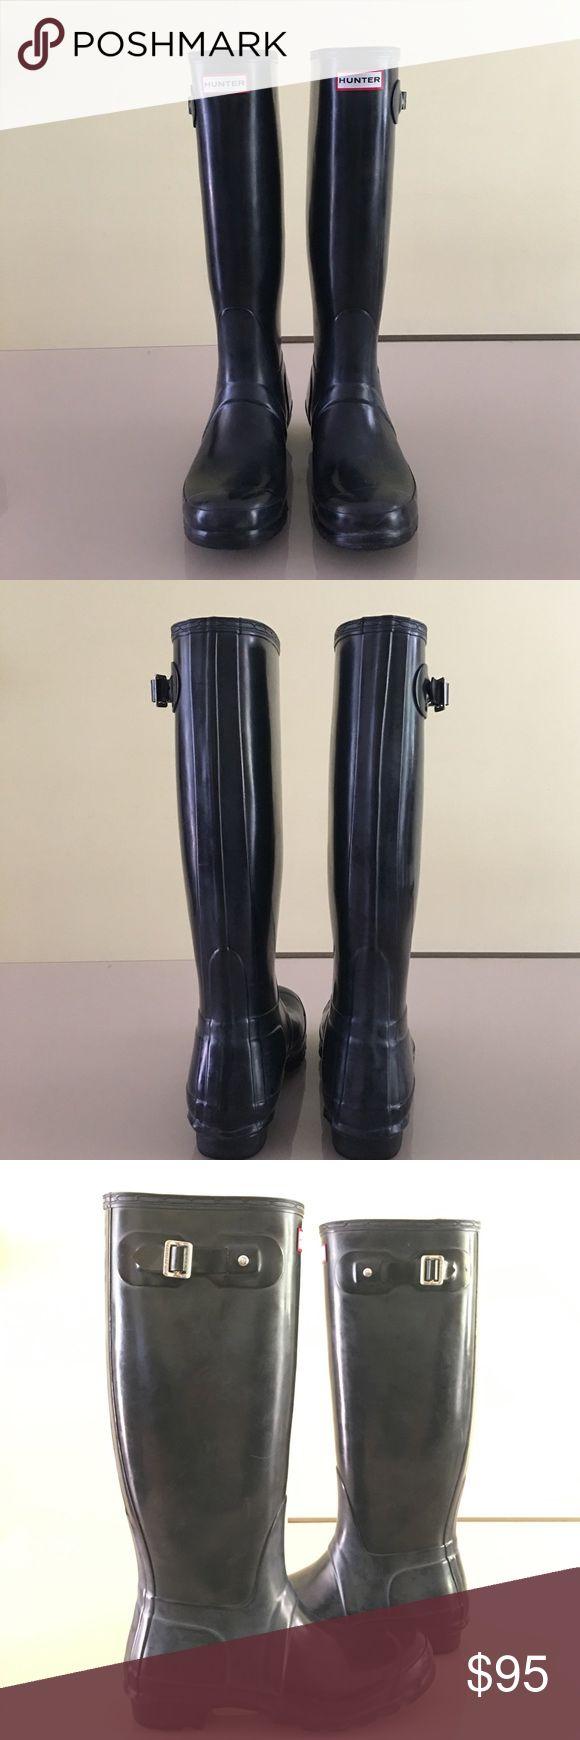 Women's Original Gloss Tall Hunter Rain Boots Hunter tall original gloss  black rain boots  In Excellent  condition!   No trades Thank you Hunter Boots Shoes Winter & Rain Boots